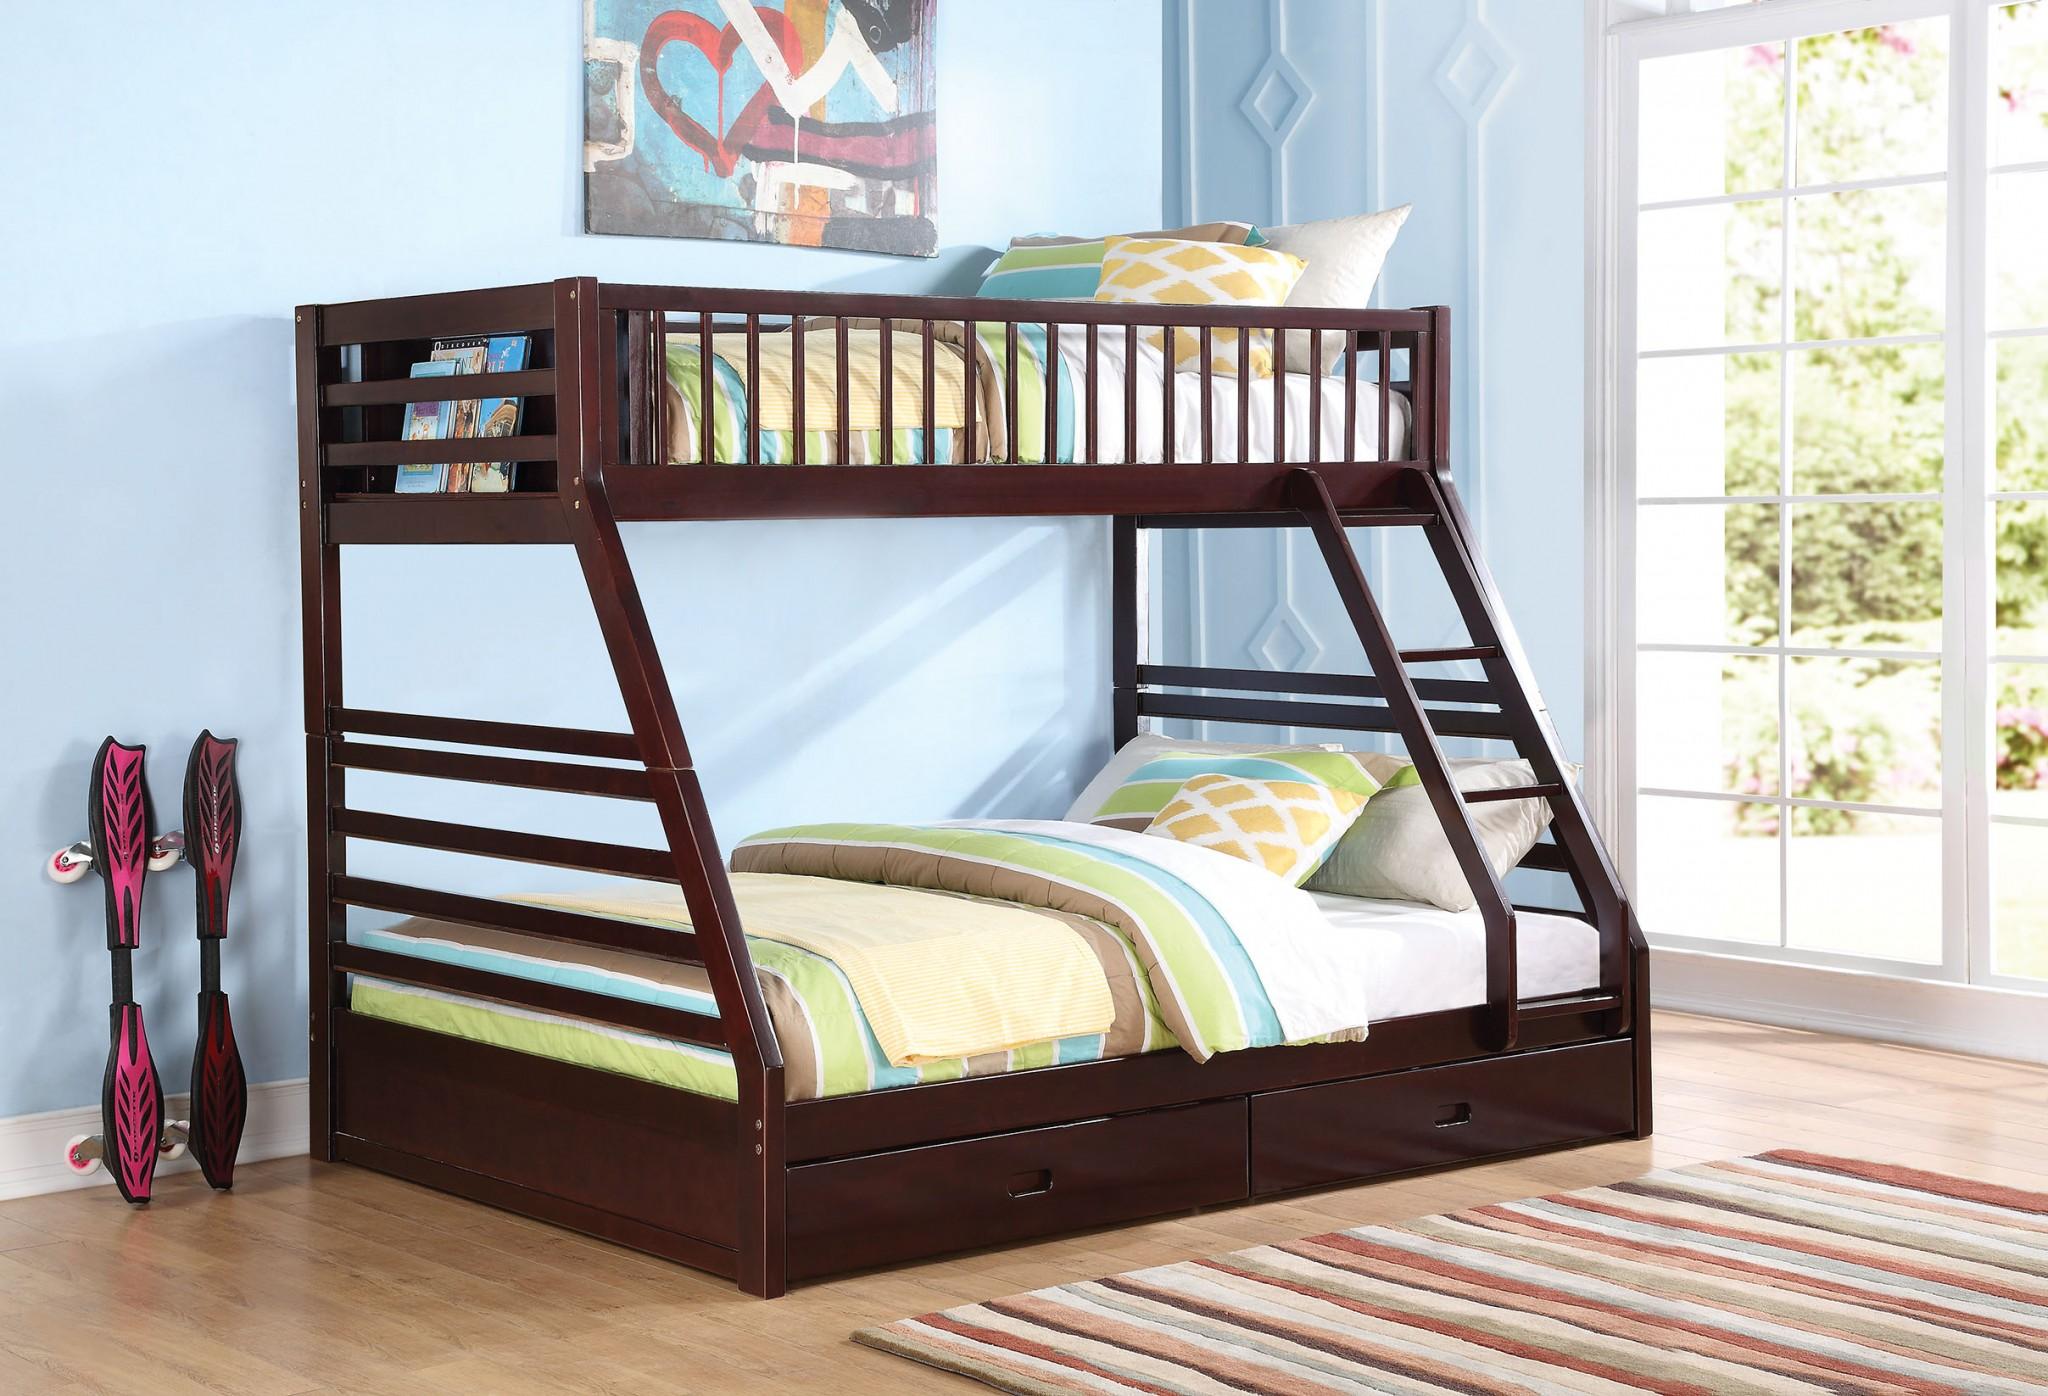 "83"" X 63"" X 65"" Espresso Pine Wood Twin XL Over Queen Bunk Bed"